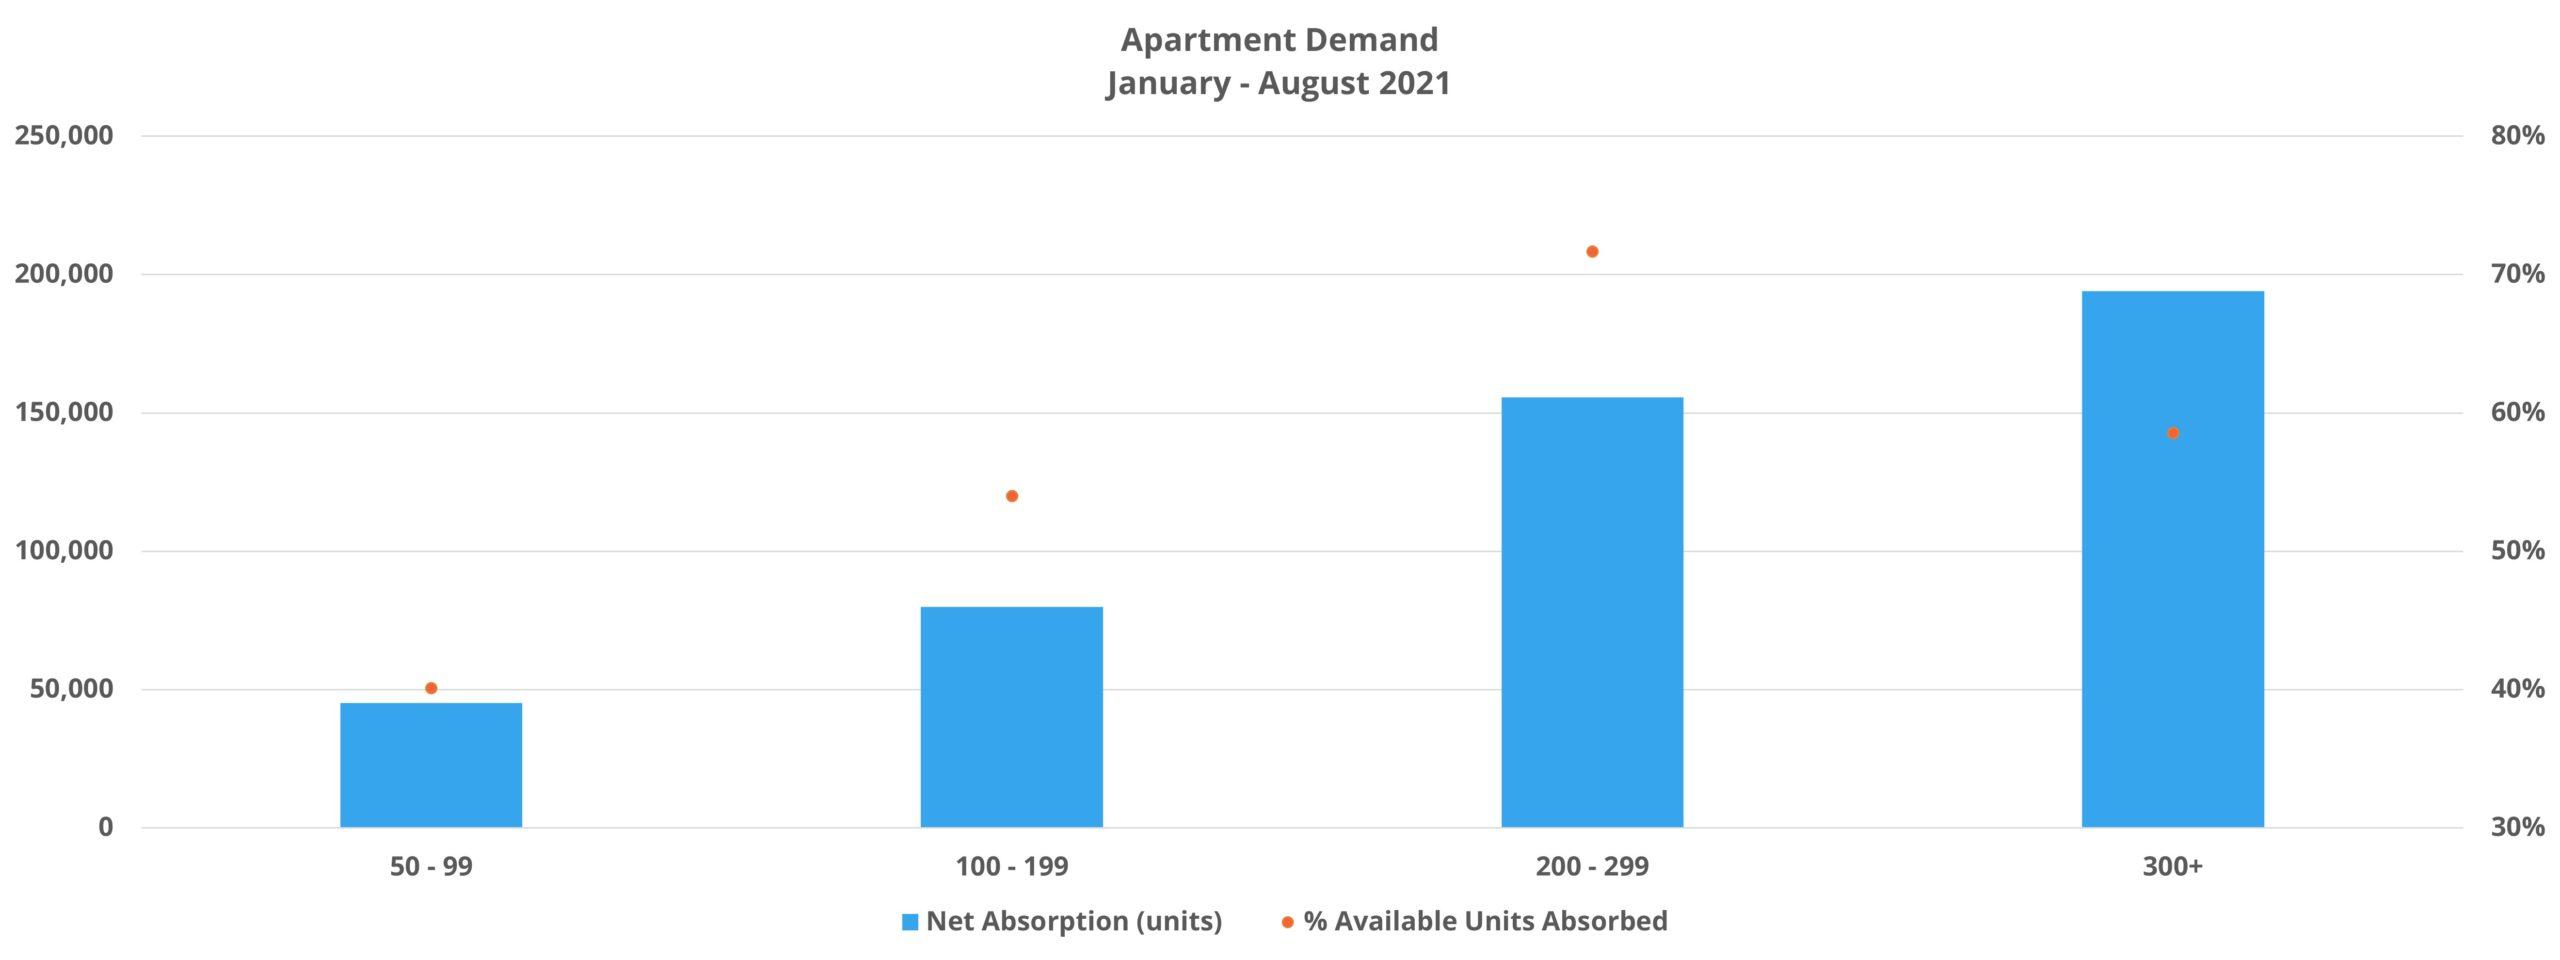 Apartment Demand